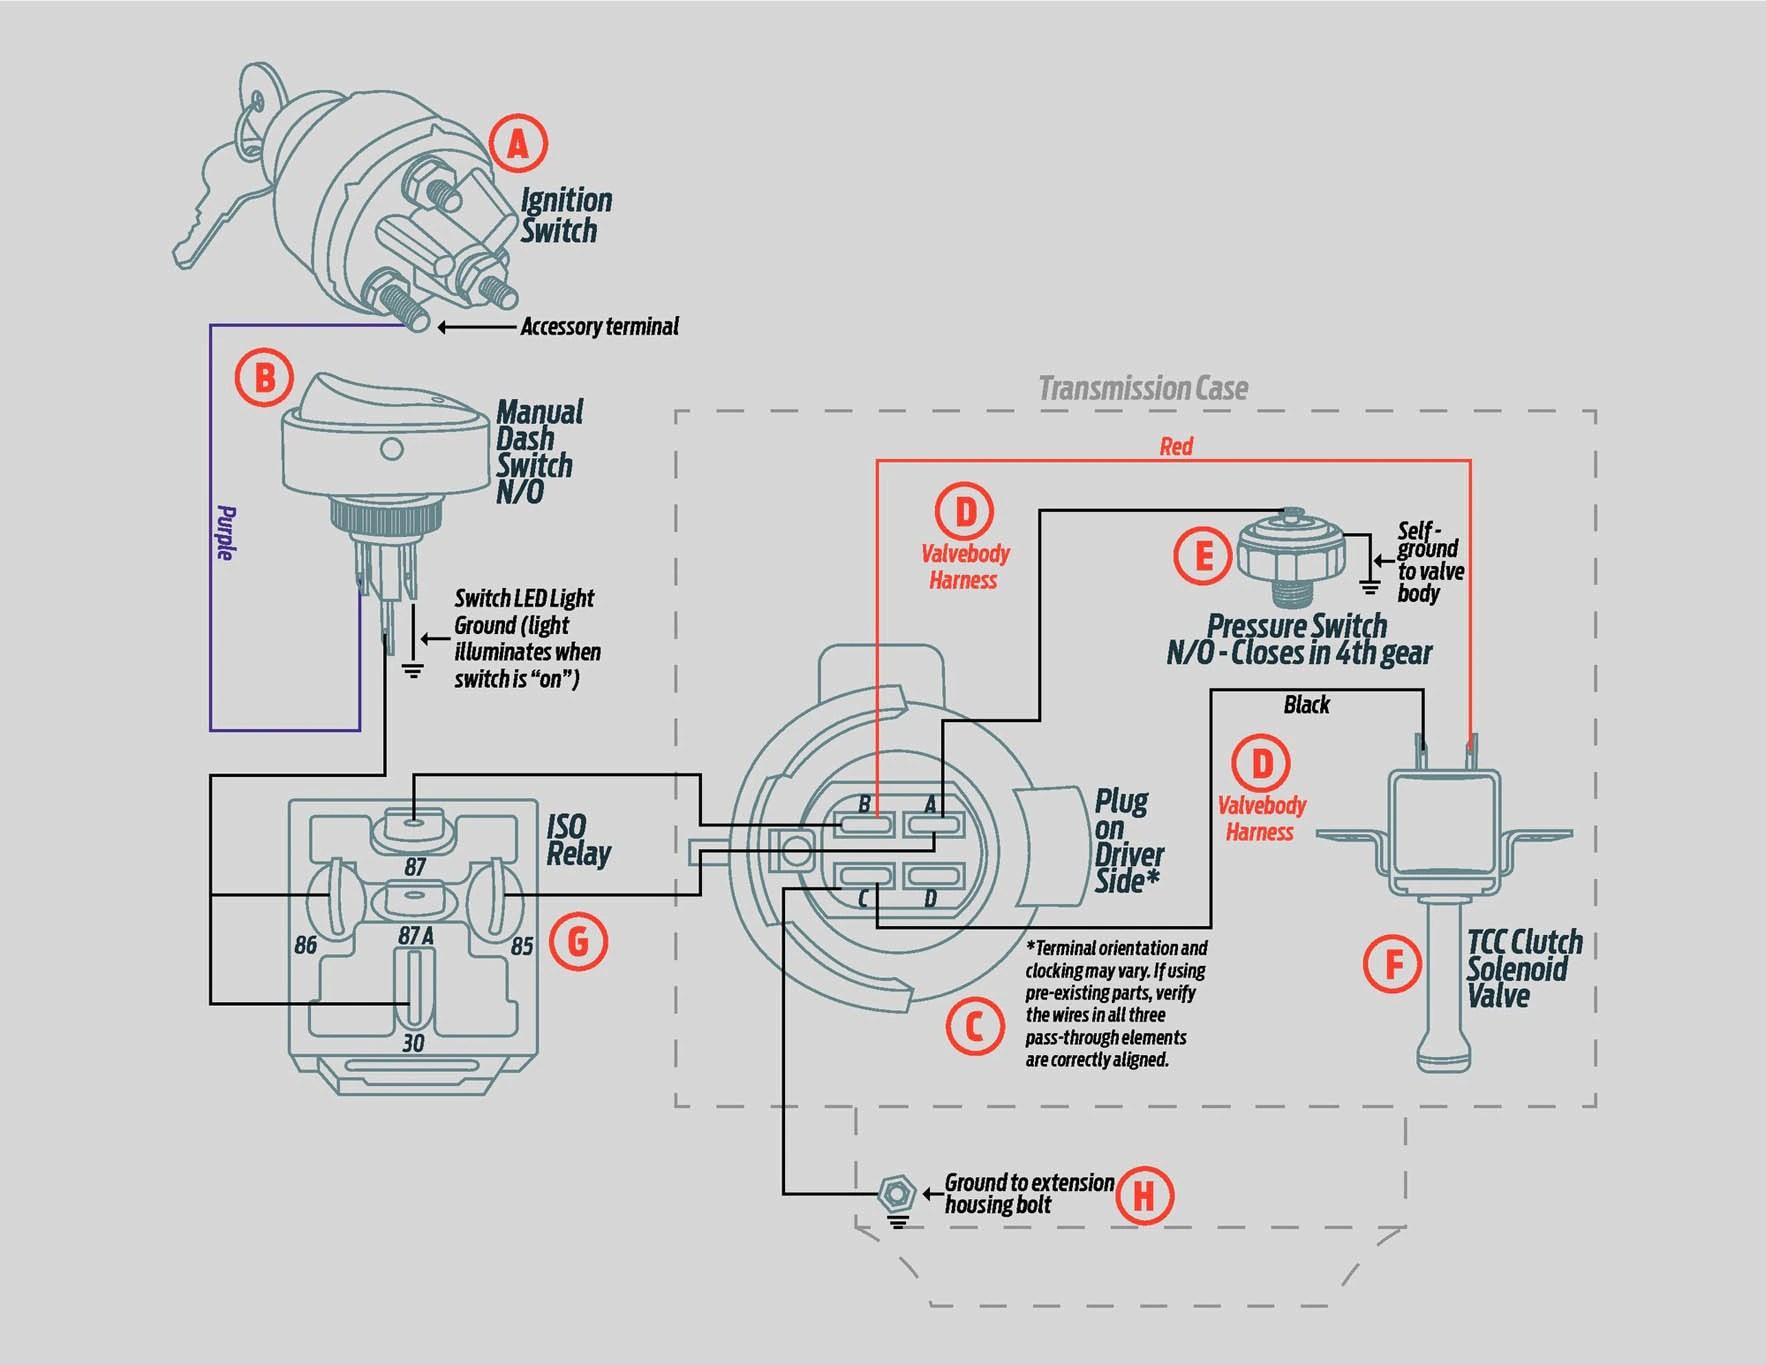 medium resolution of 88 700r4 internal wiring diagram wiring diagrams konsult 4l60e wiring harness diagram besides 200r4 transmission lock up wiring